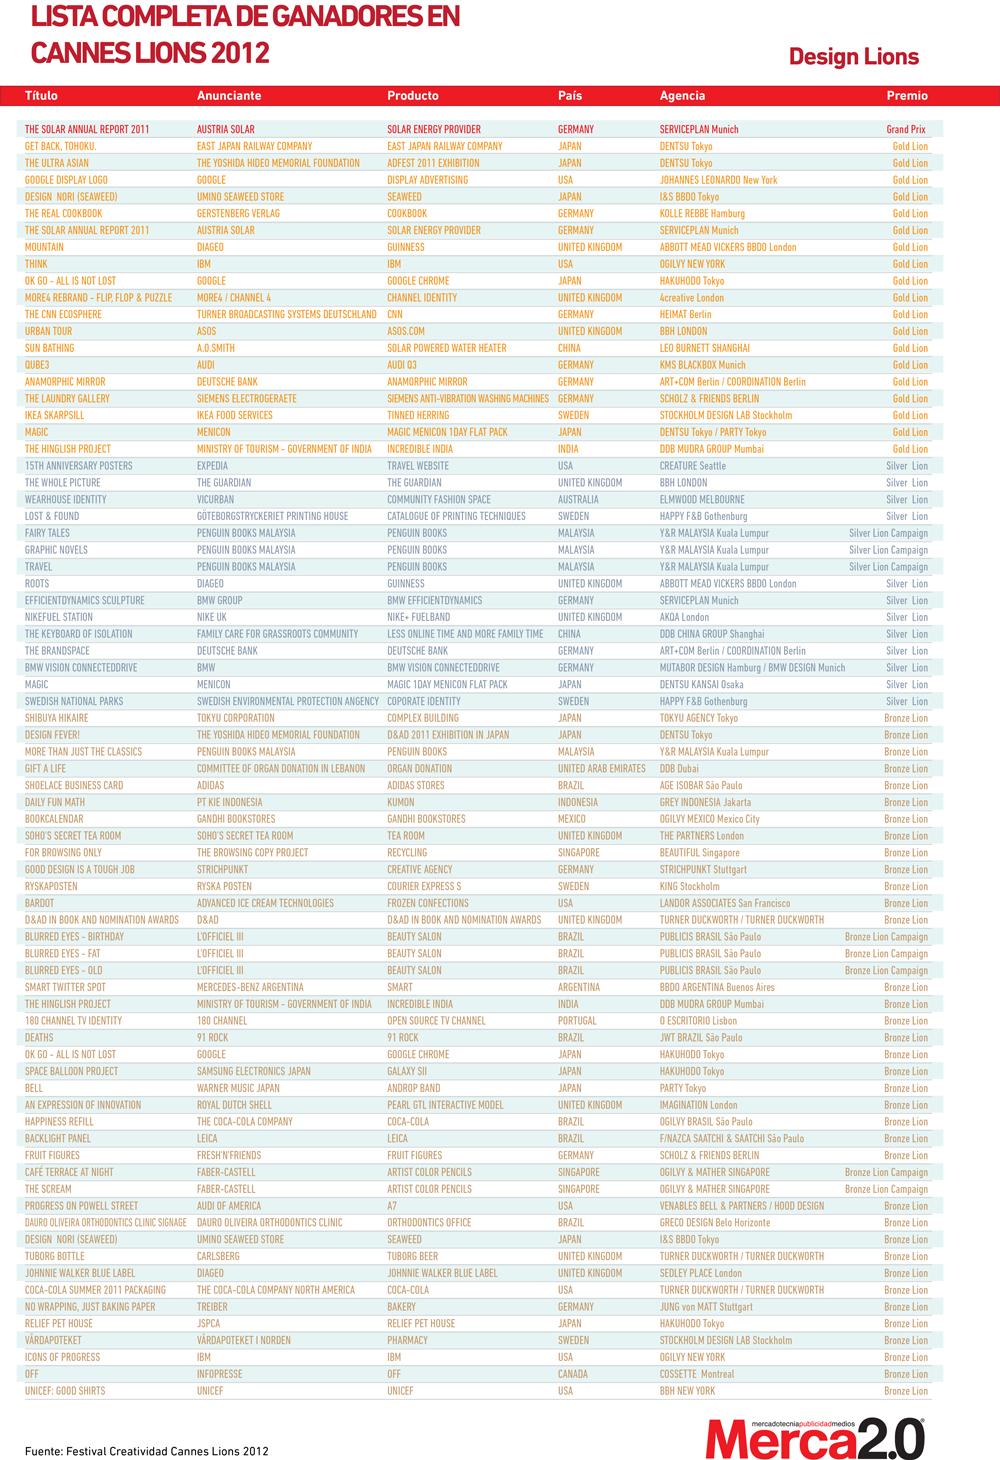 Lista completa de ganadores Cannes Design Lions 2012